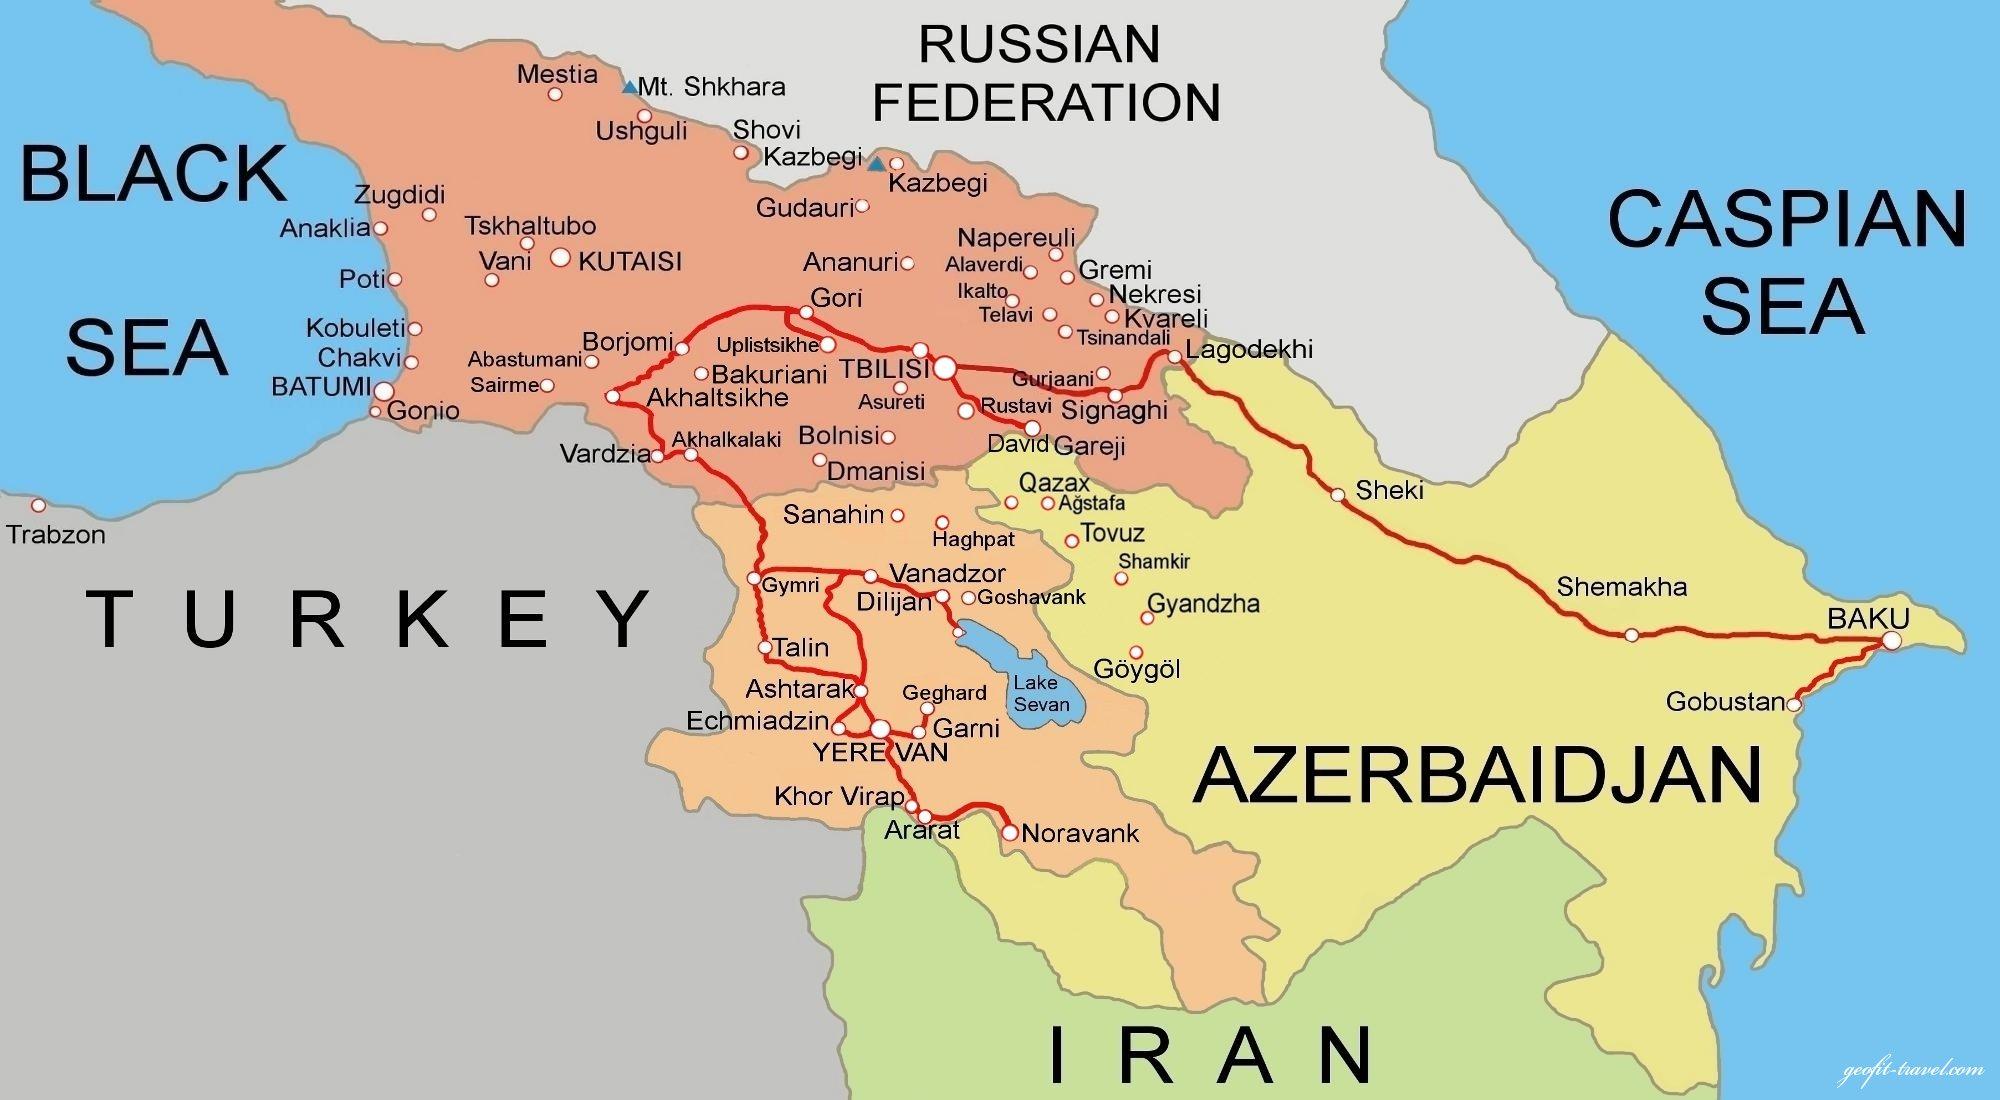 Touroperator GeofitTravel ArmeniaGeorgiaAzerbaijan Travel - Yerevan georgia map